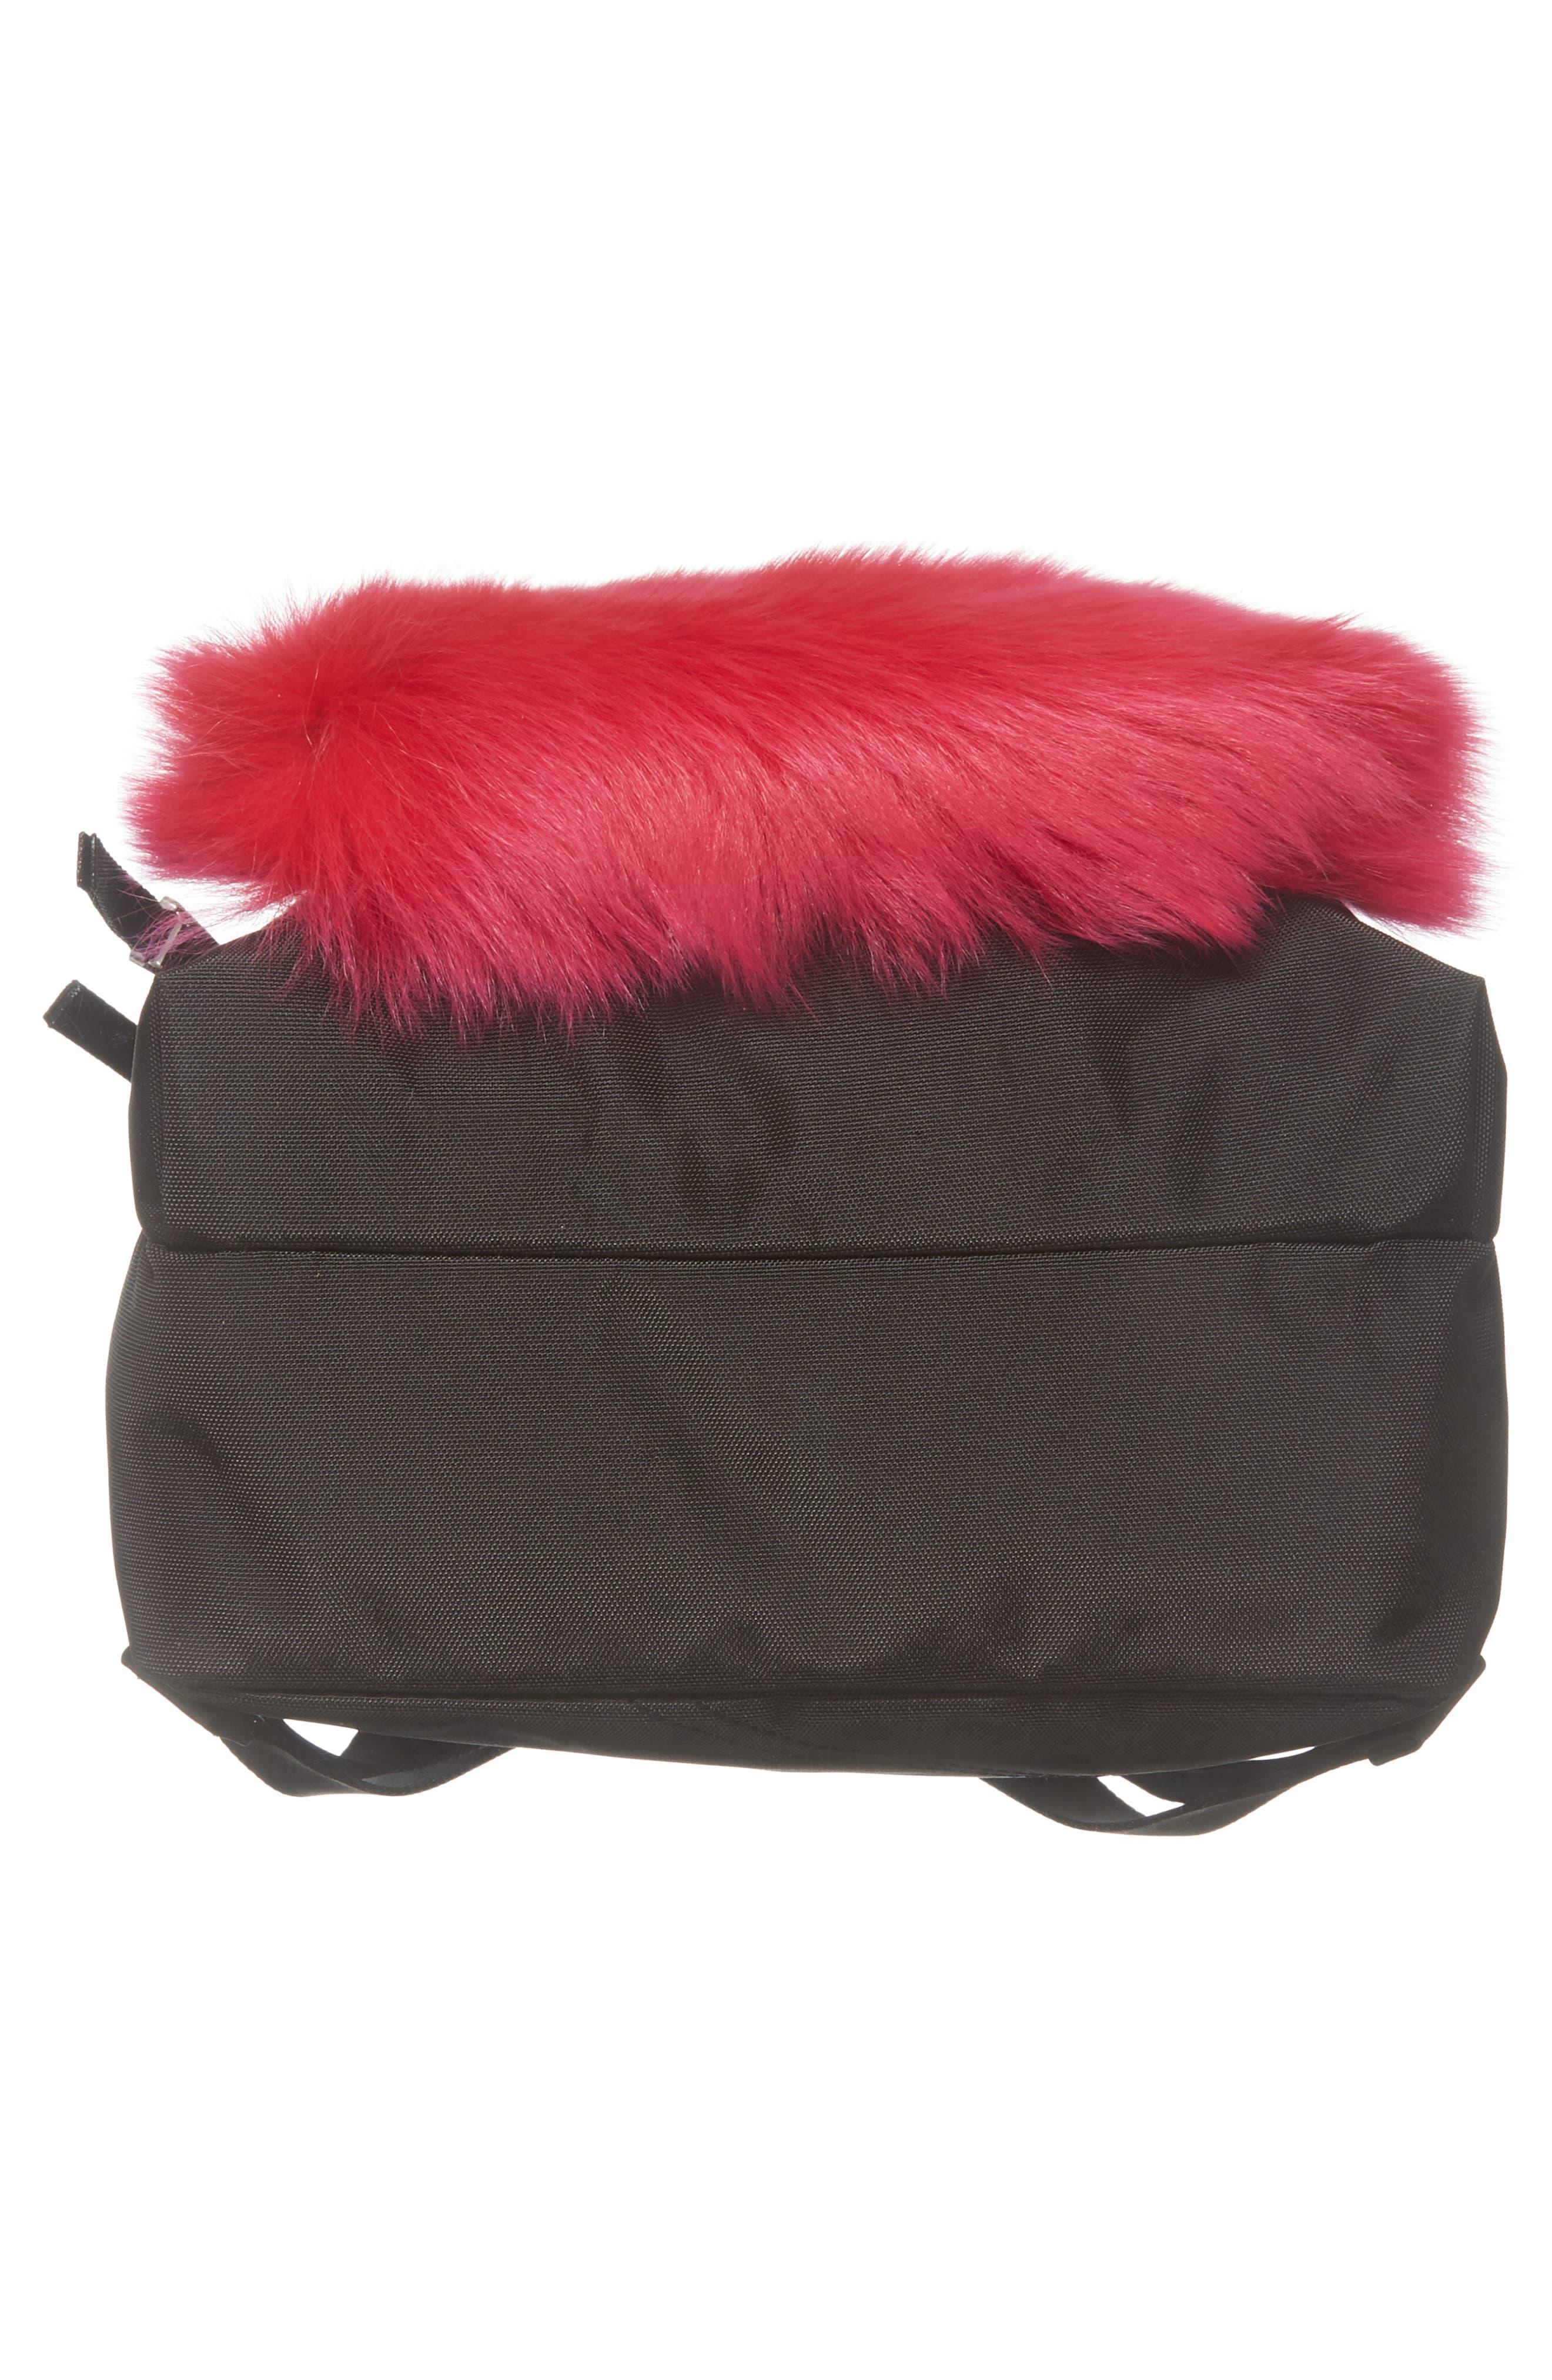 Love Medium Trek Nylon & Genuine Shearling Backpack,                             Alternate thumbnail 6, color,                             Black Multi